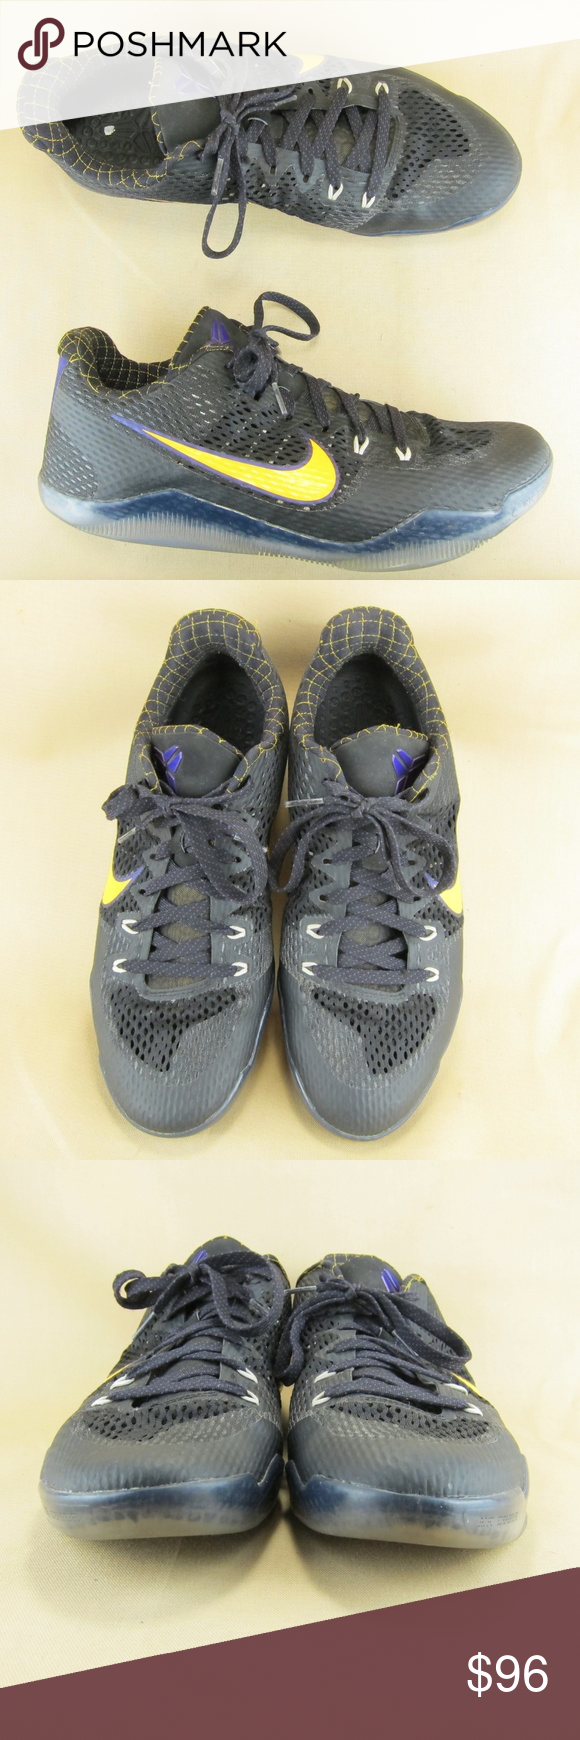 new arrival 22fc6 d9de6 Nike Kobe XI 11 Carpe Diem 836183-015 US 12 EU 46 You are purchasing